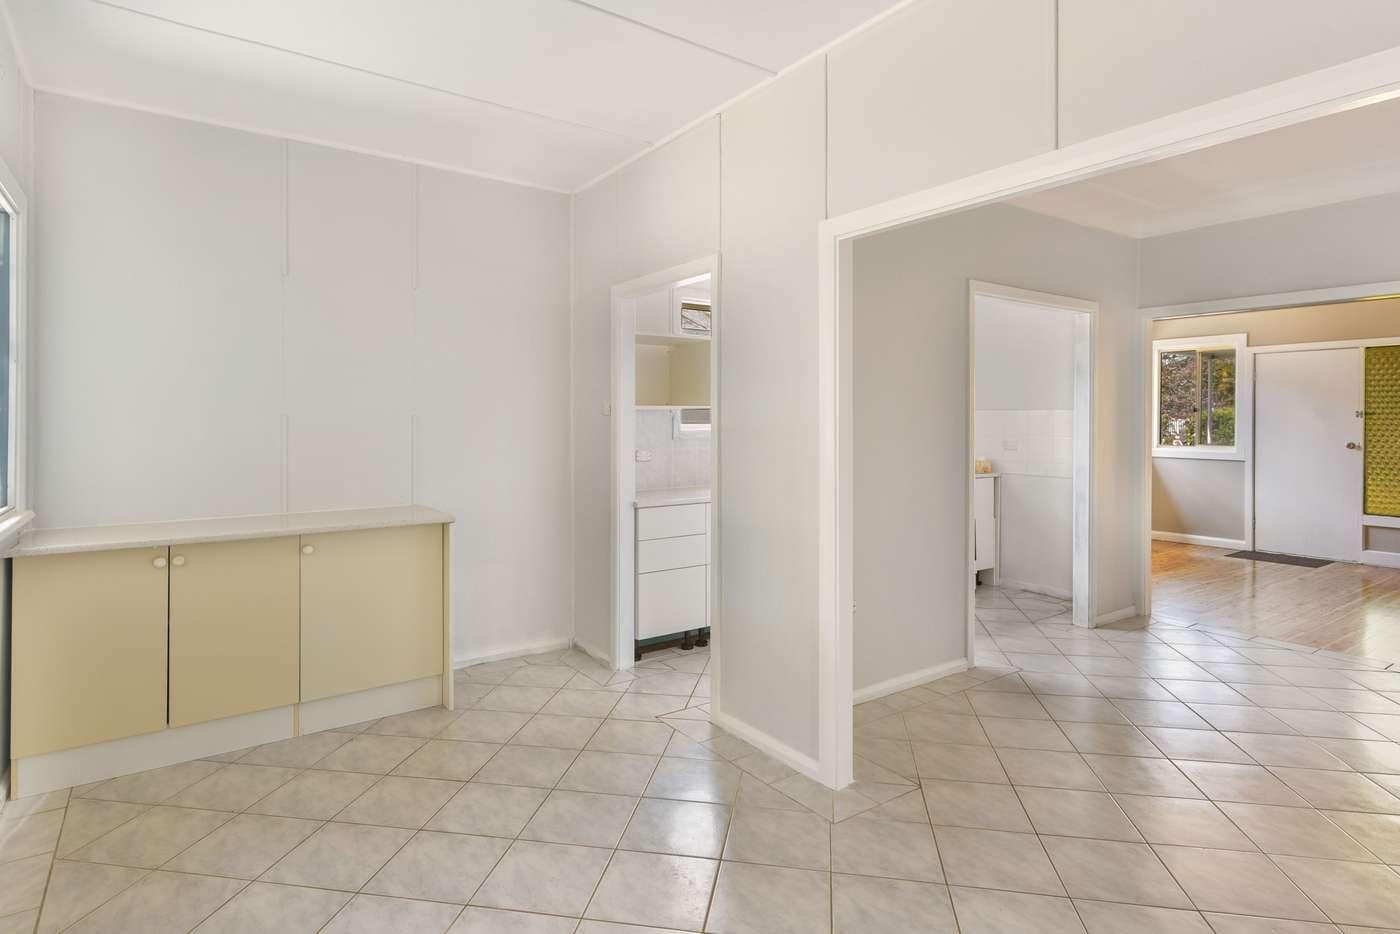 Seventh view of Homely house listing, 65 Beach Street, Ettalong Beach NSW 2257